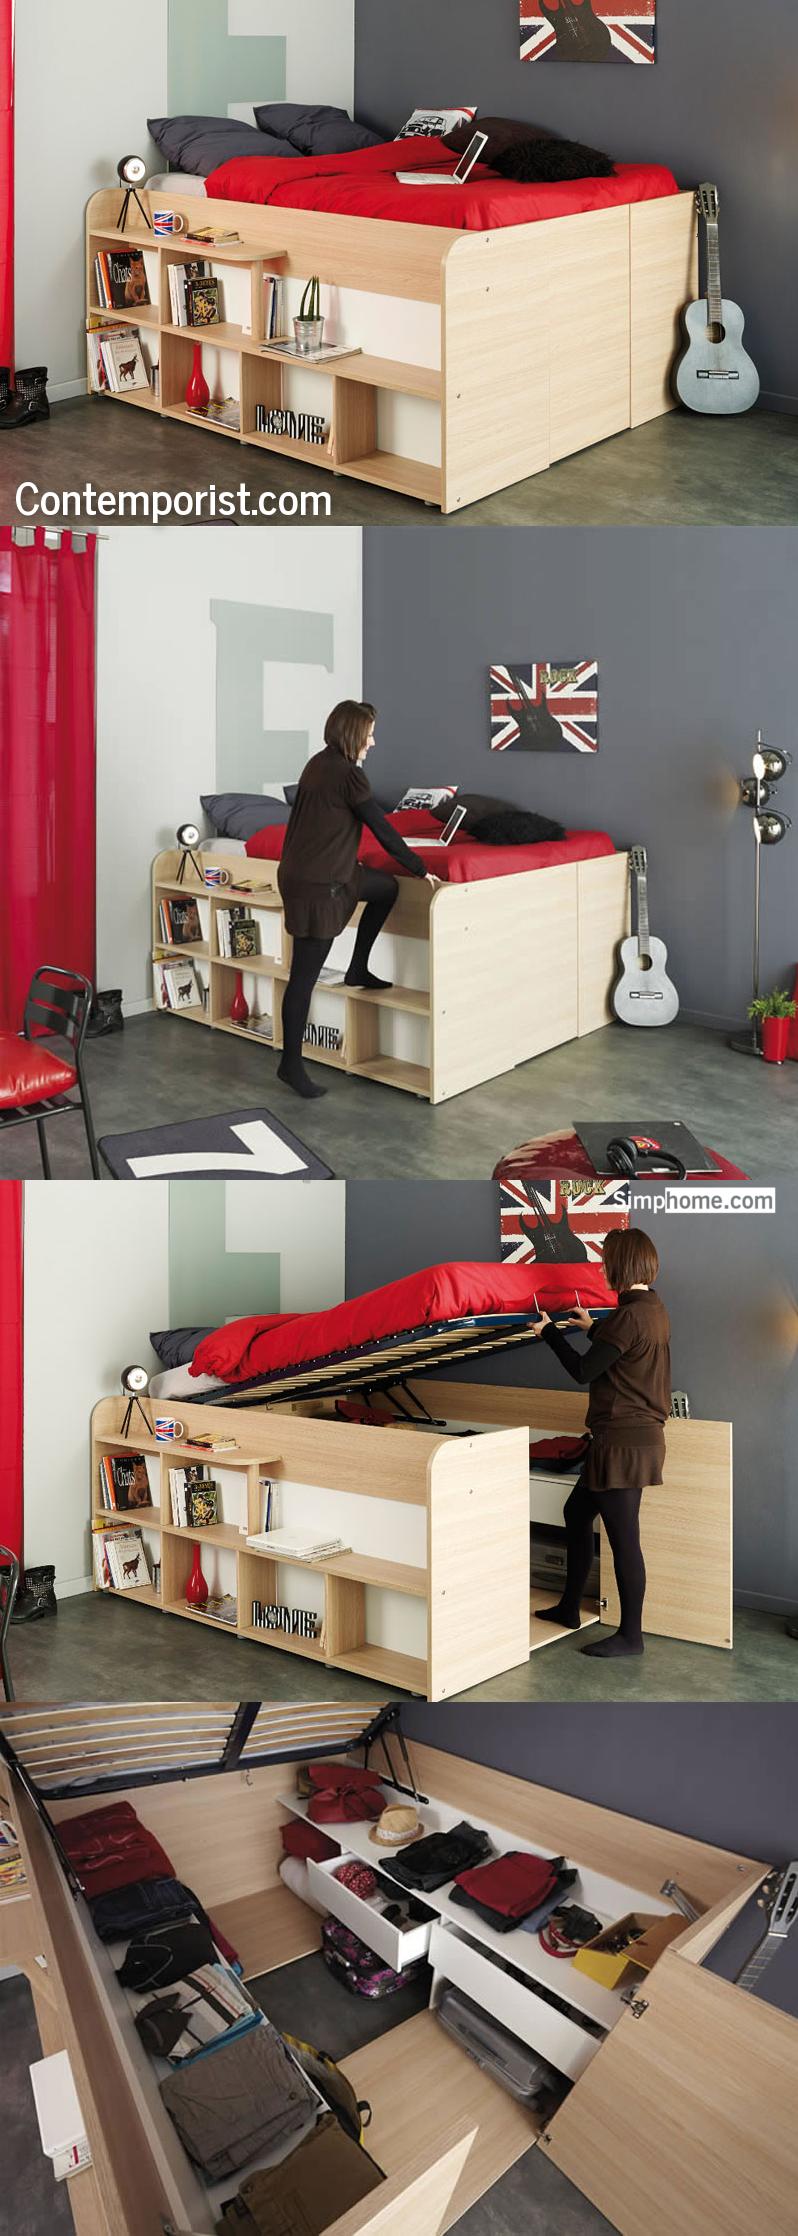 Bed and closet combination Simphome com 8